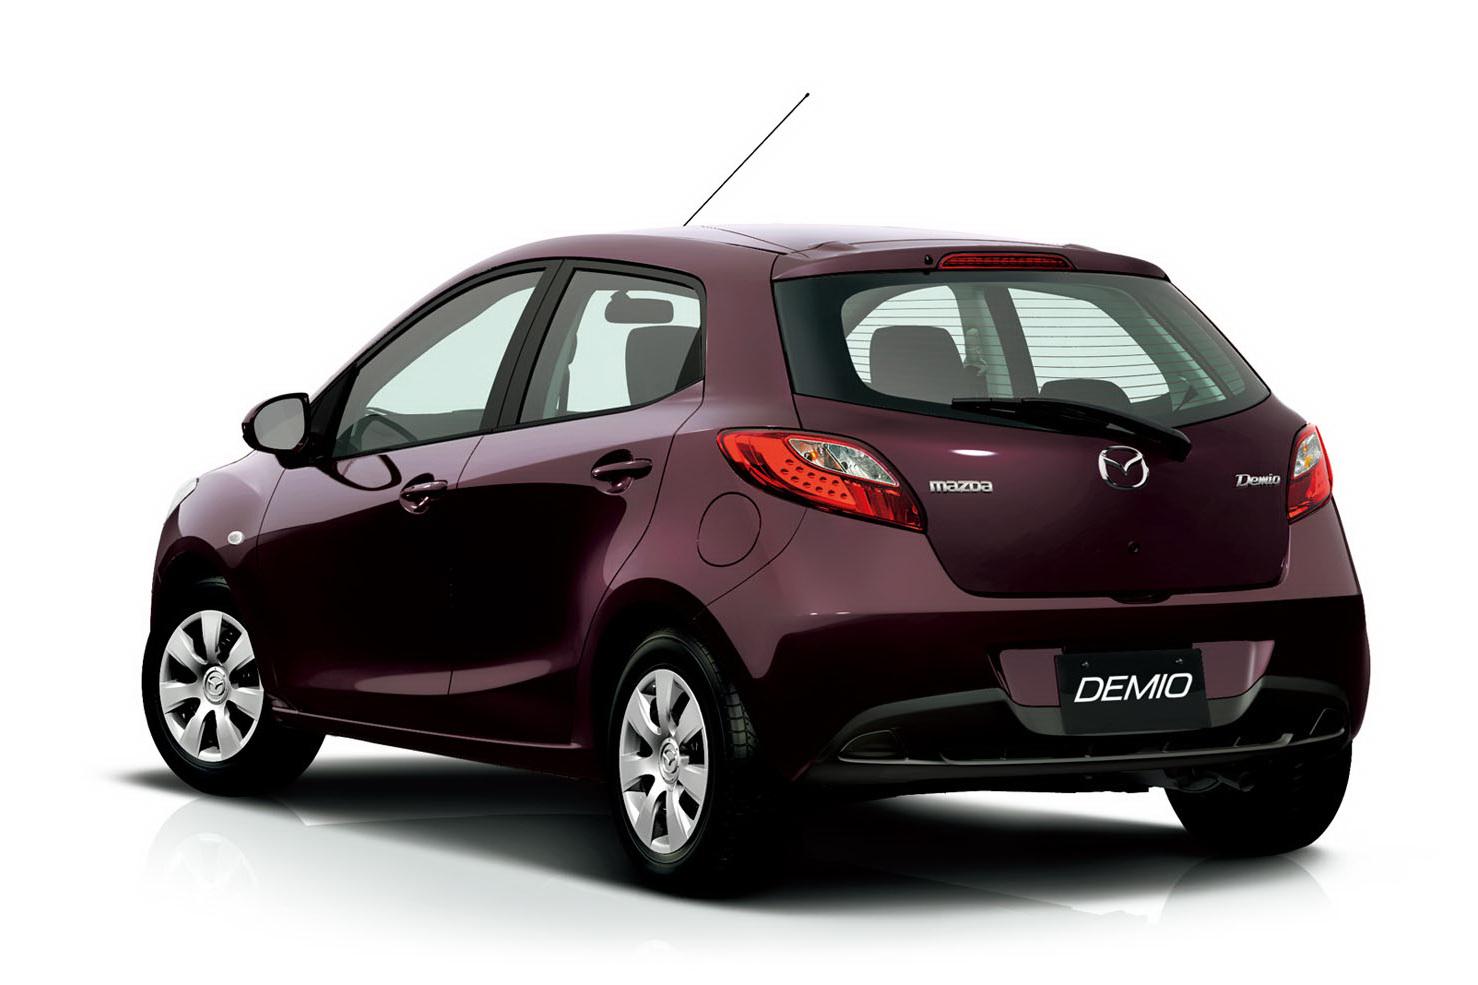 2012 Mazda Demio 13-SKYACTIV Arrives in Japan [Image Gallery] - autoevolution